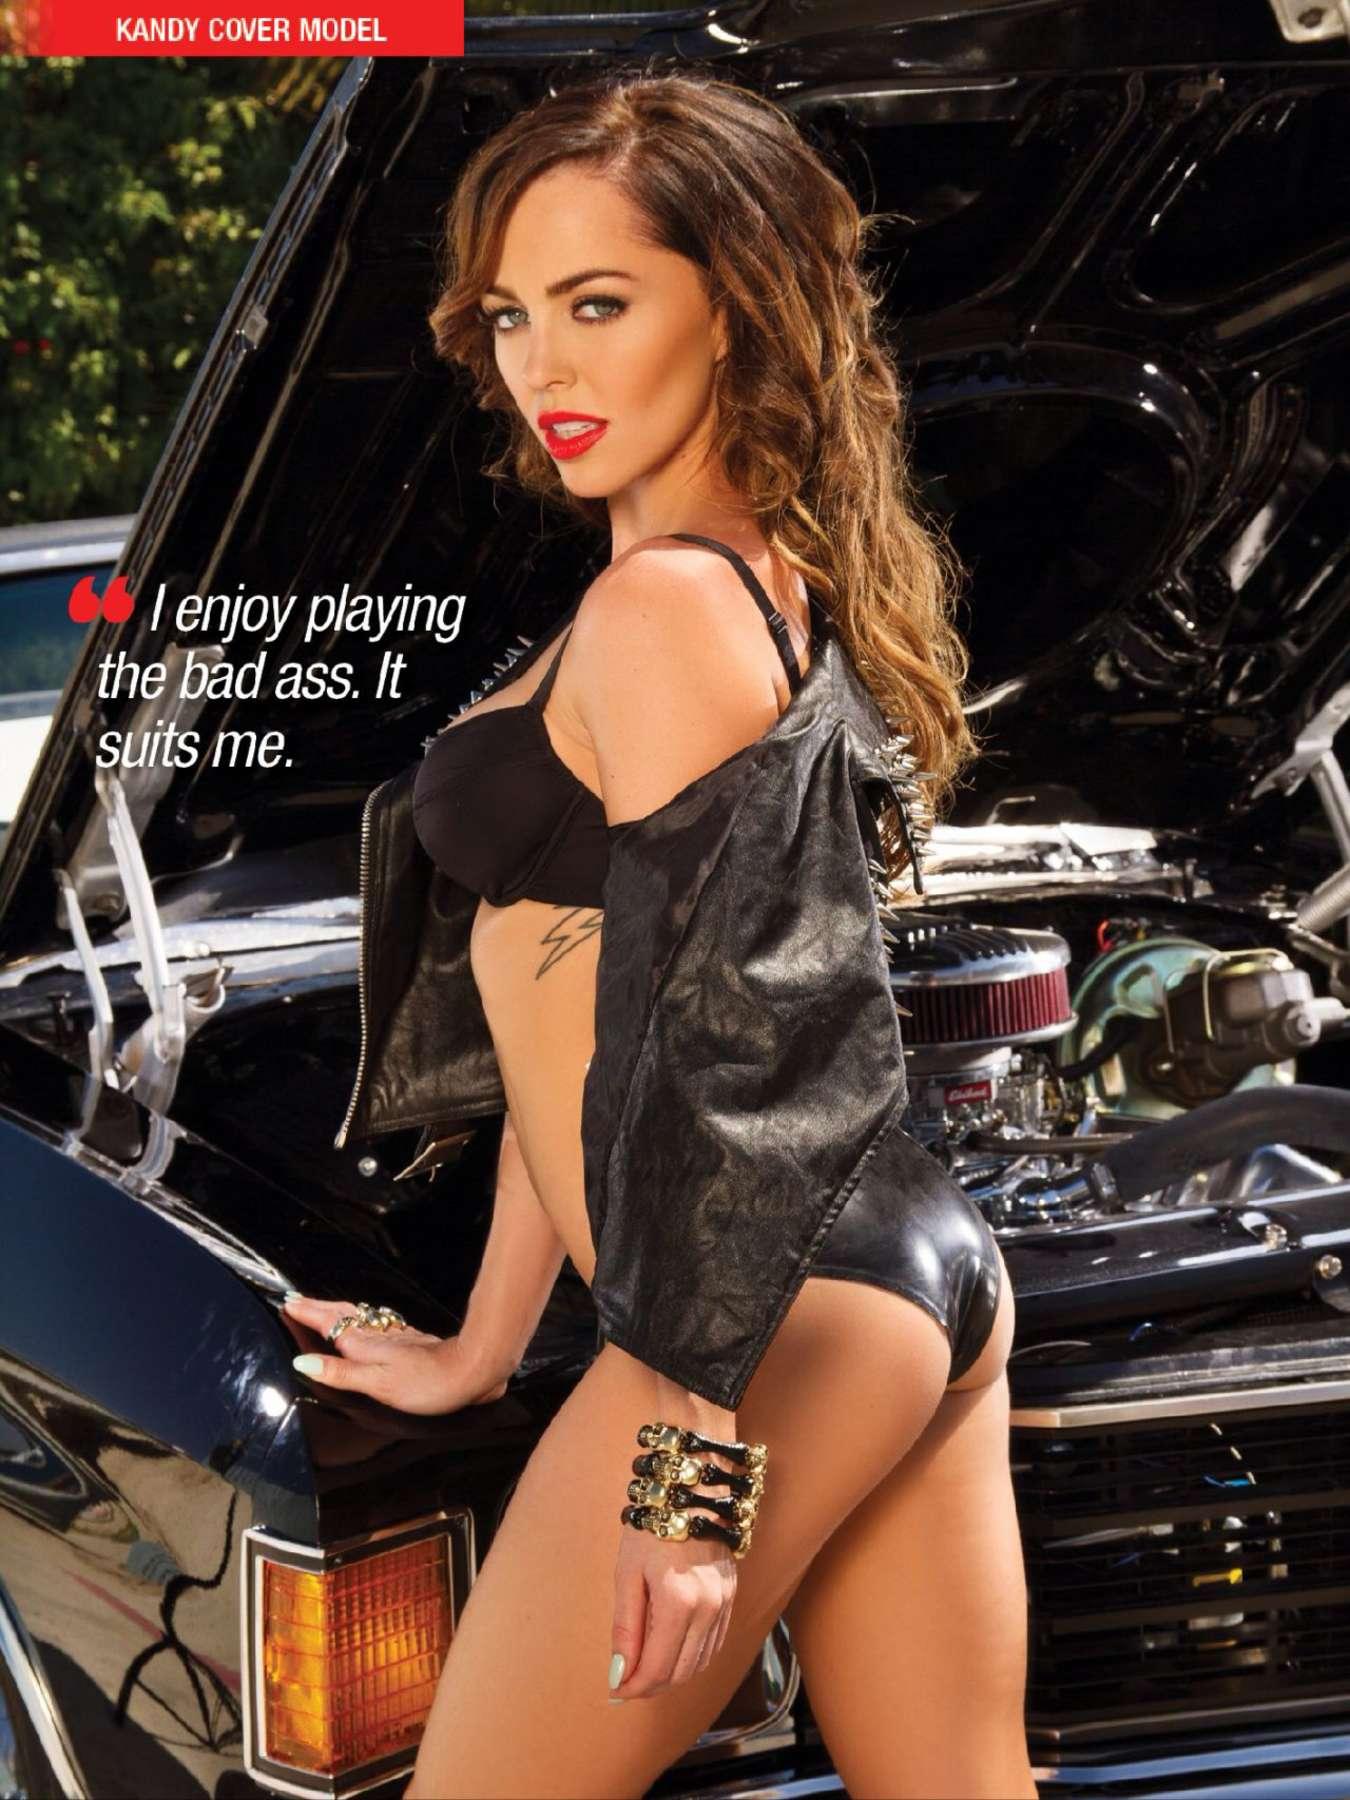 Kandy Magazine 2014